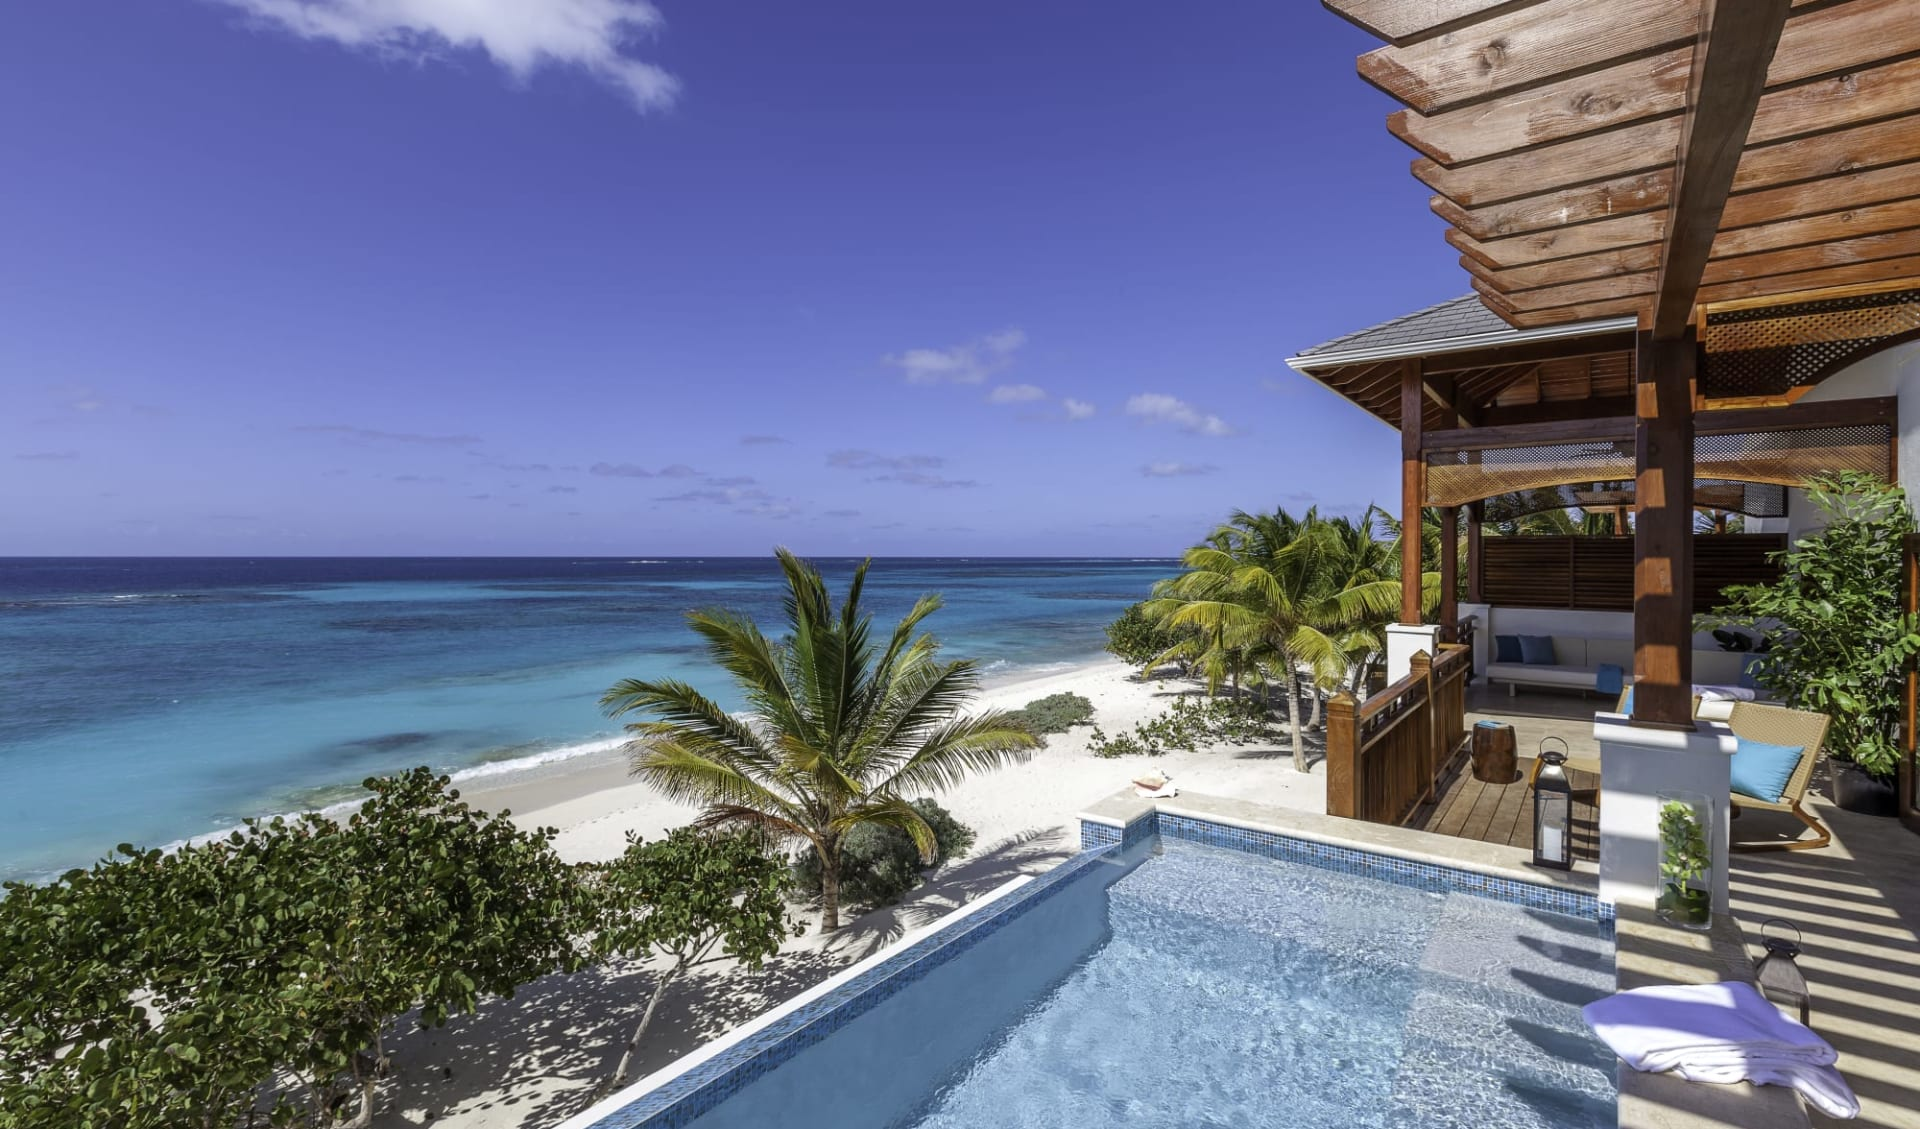 Zemi Beach House in Shoal Bay East:  Exterior Zemi Beach House Anguilla - Hotel und Strandansicht cHotel